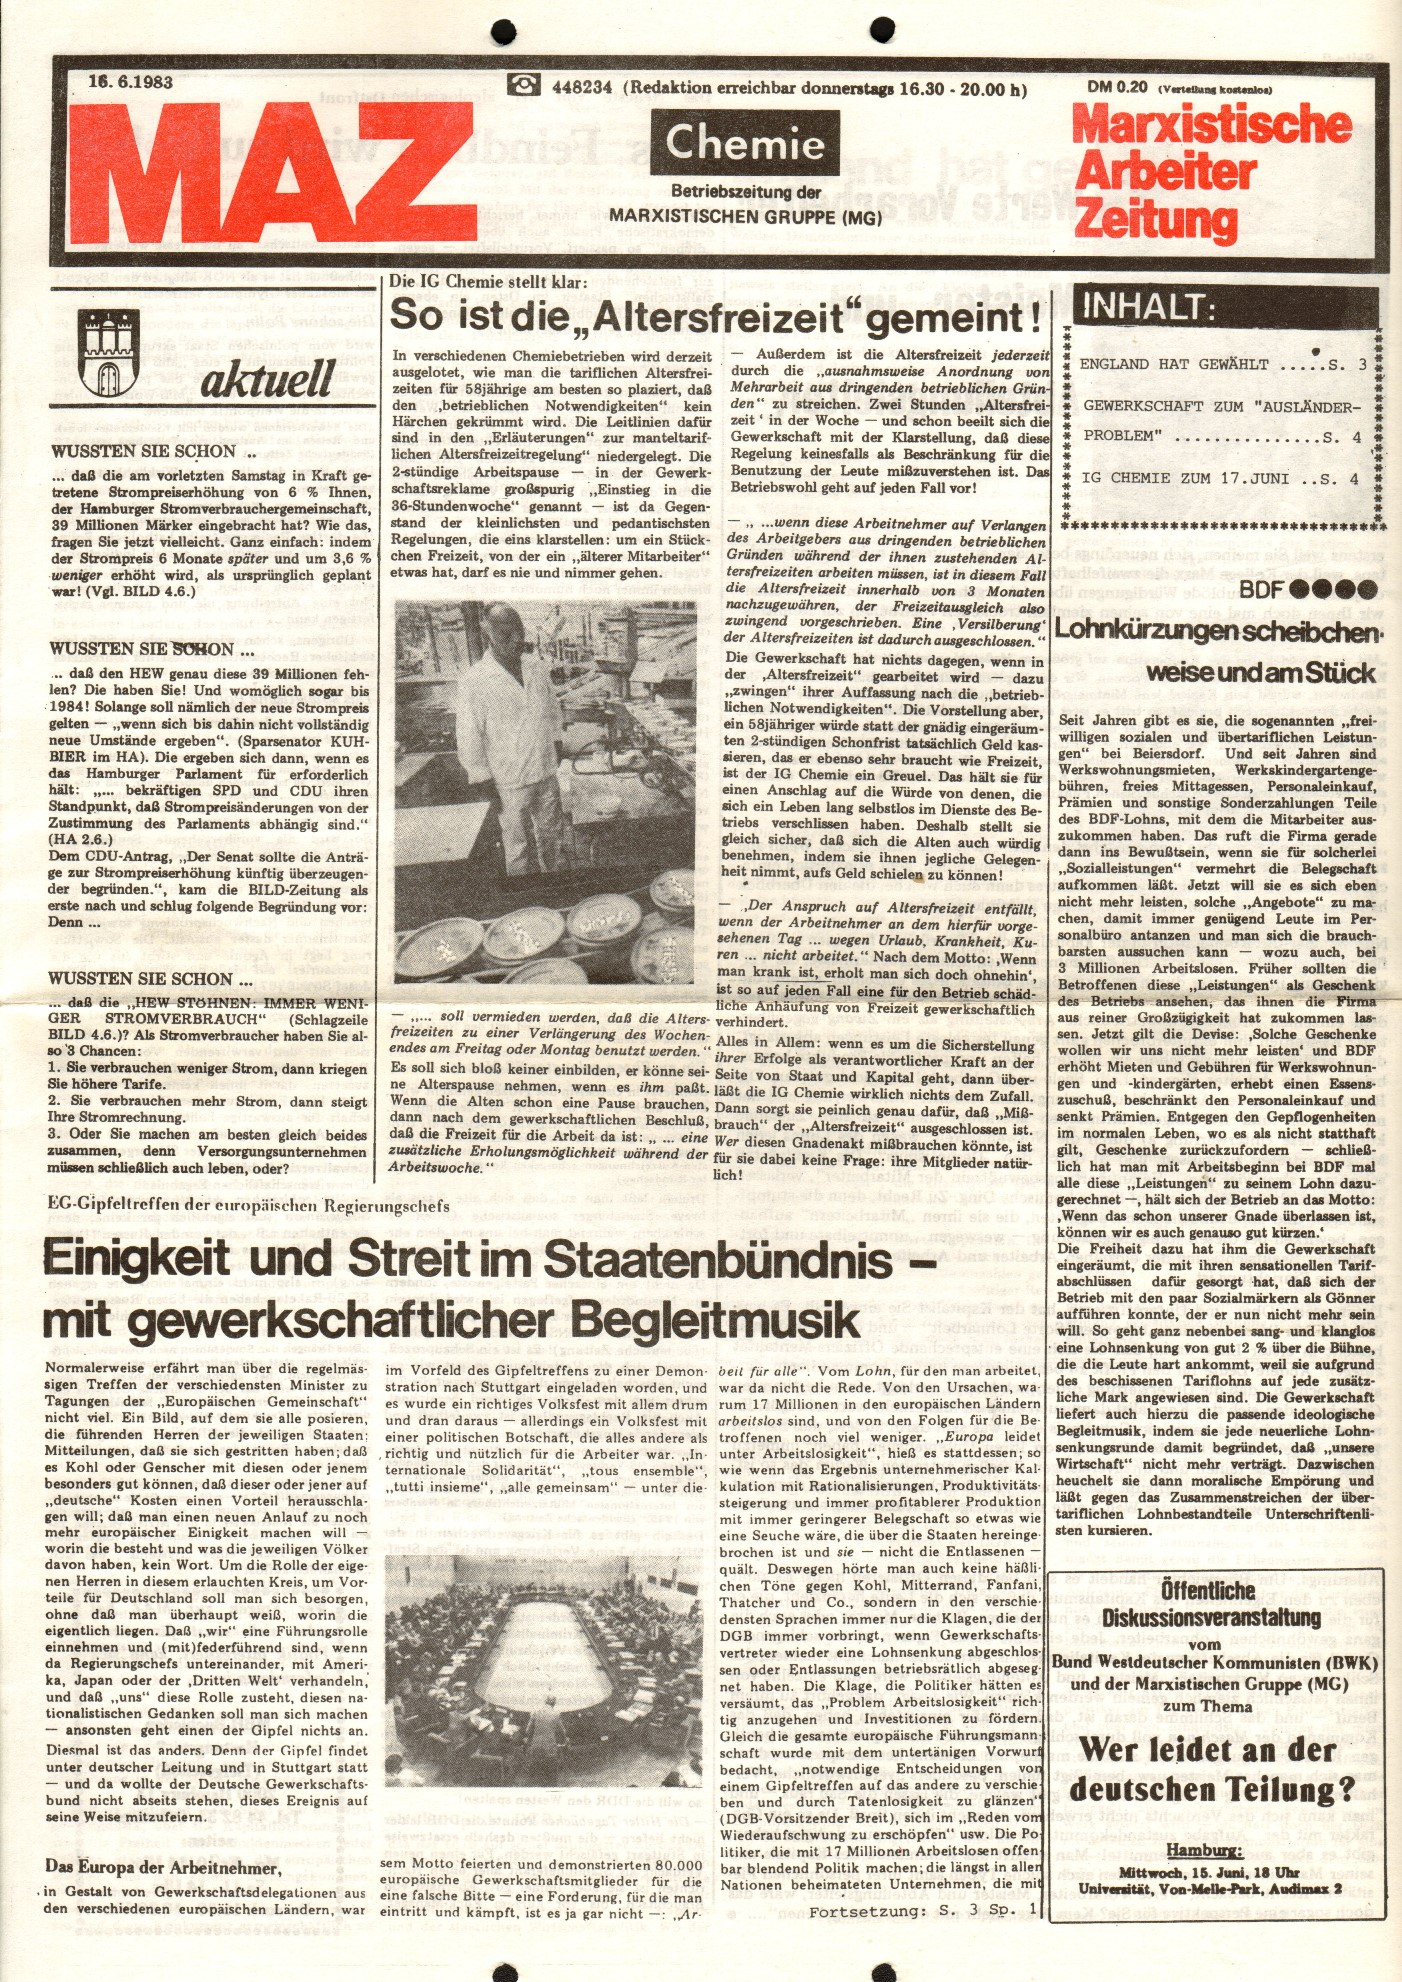 Hamburg_MG_MAZ_Chemie_19830616_01